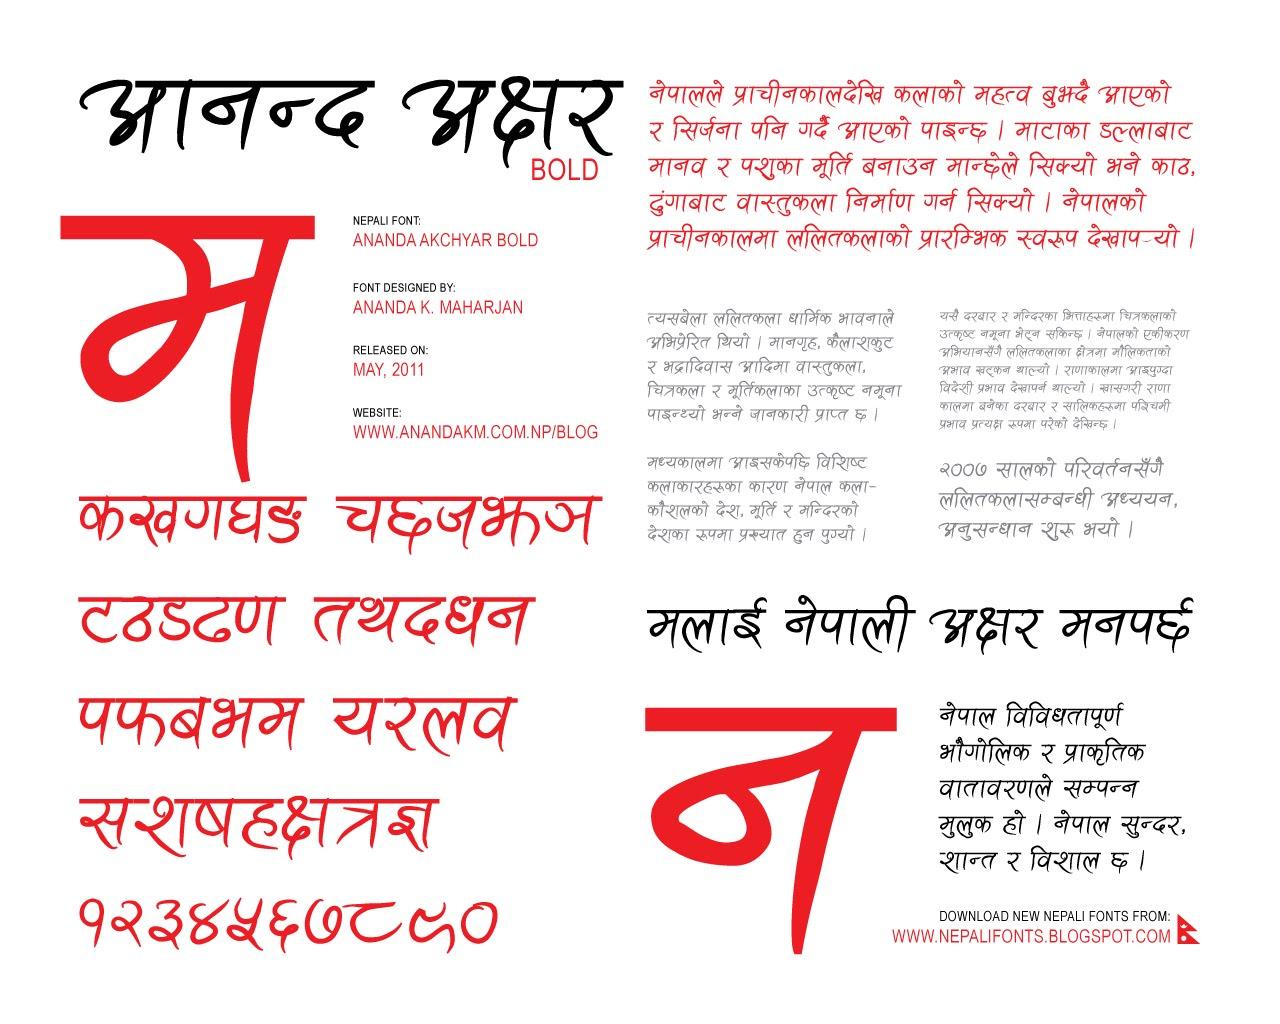 ananda vikatan pdf free download